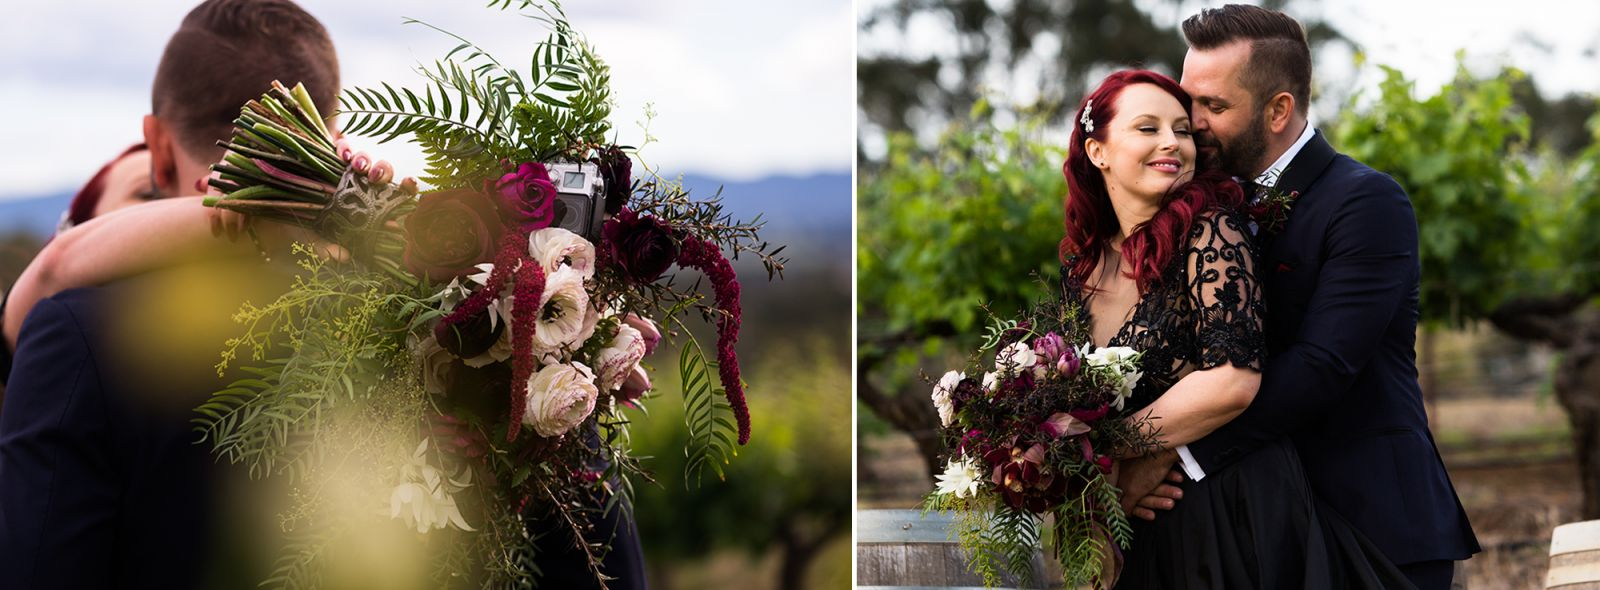 10_wedding-inspiration-bridal-bokeh-by-awesome-wedding-photographer